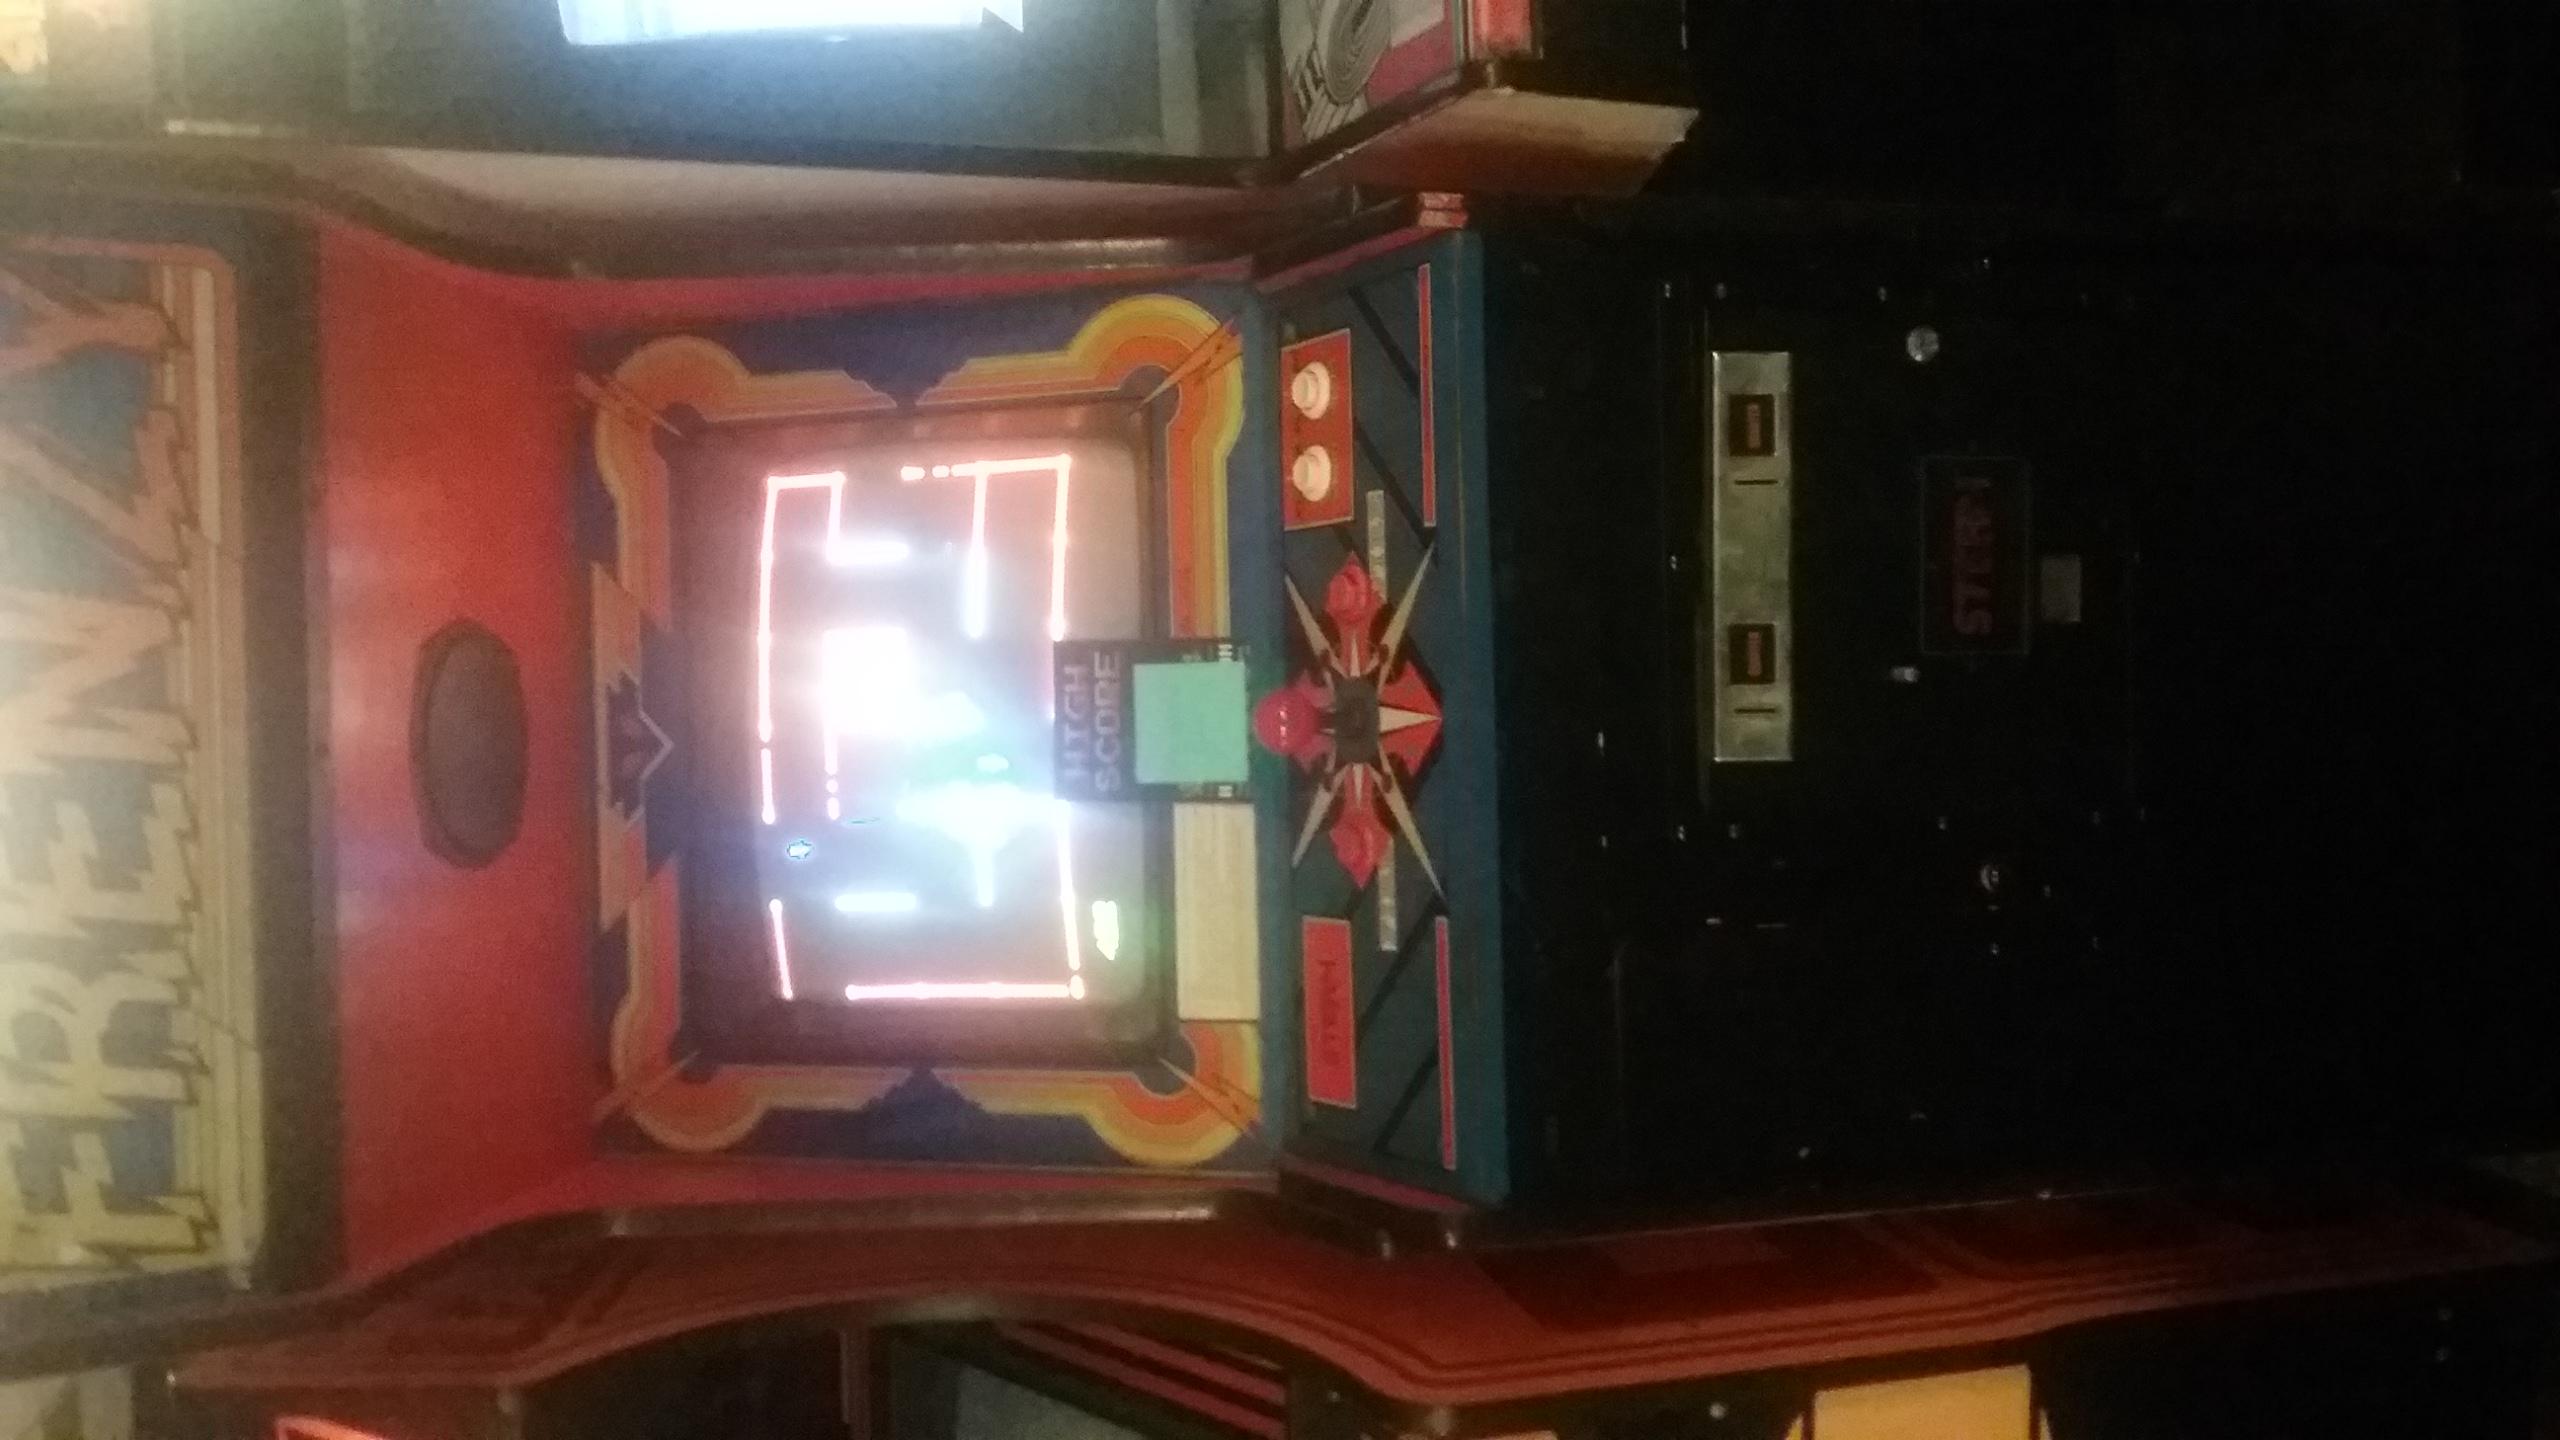 Immortalgeo: Frenzy (Arcade) 6,769 points on 2016-12-05 19:21:42